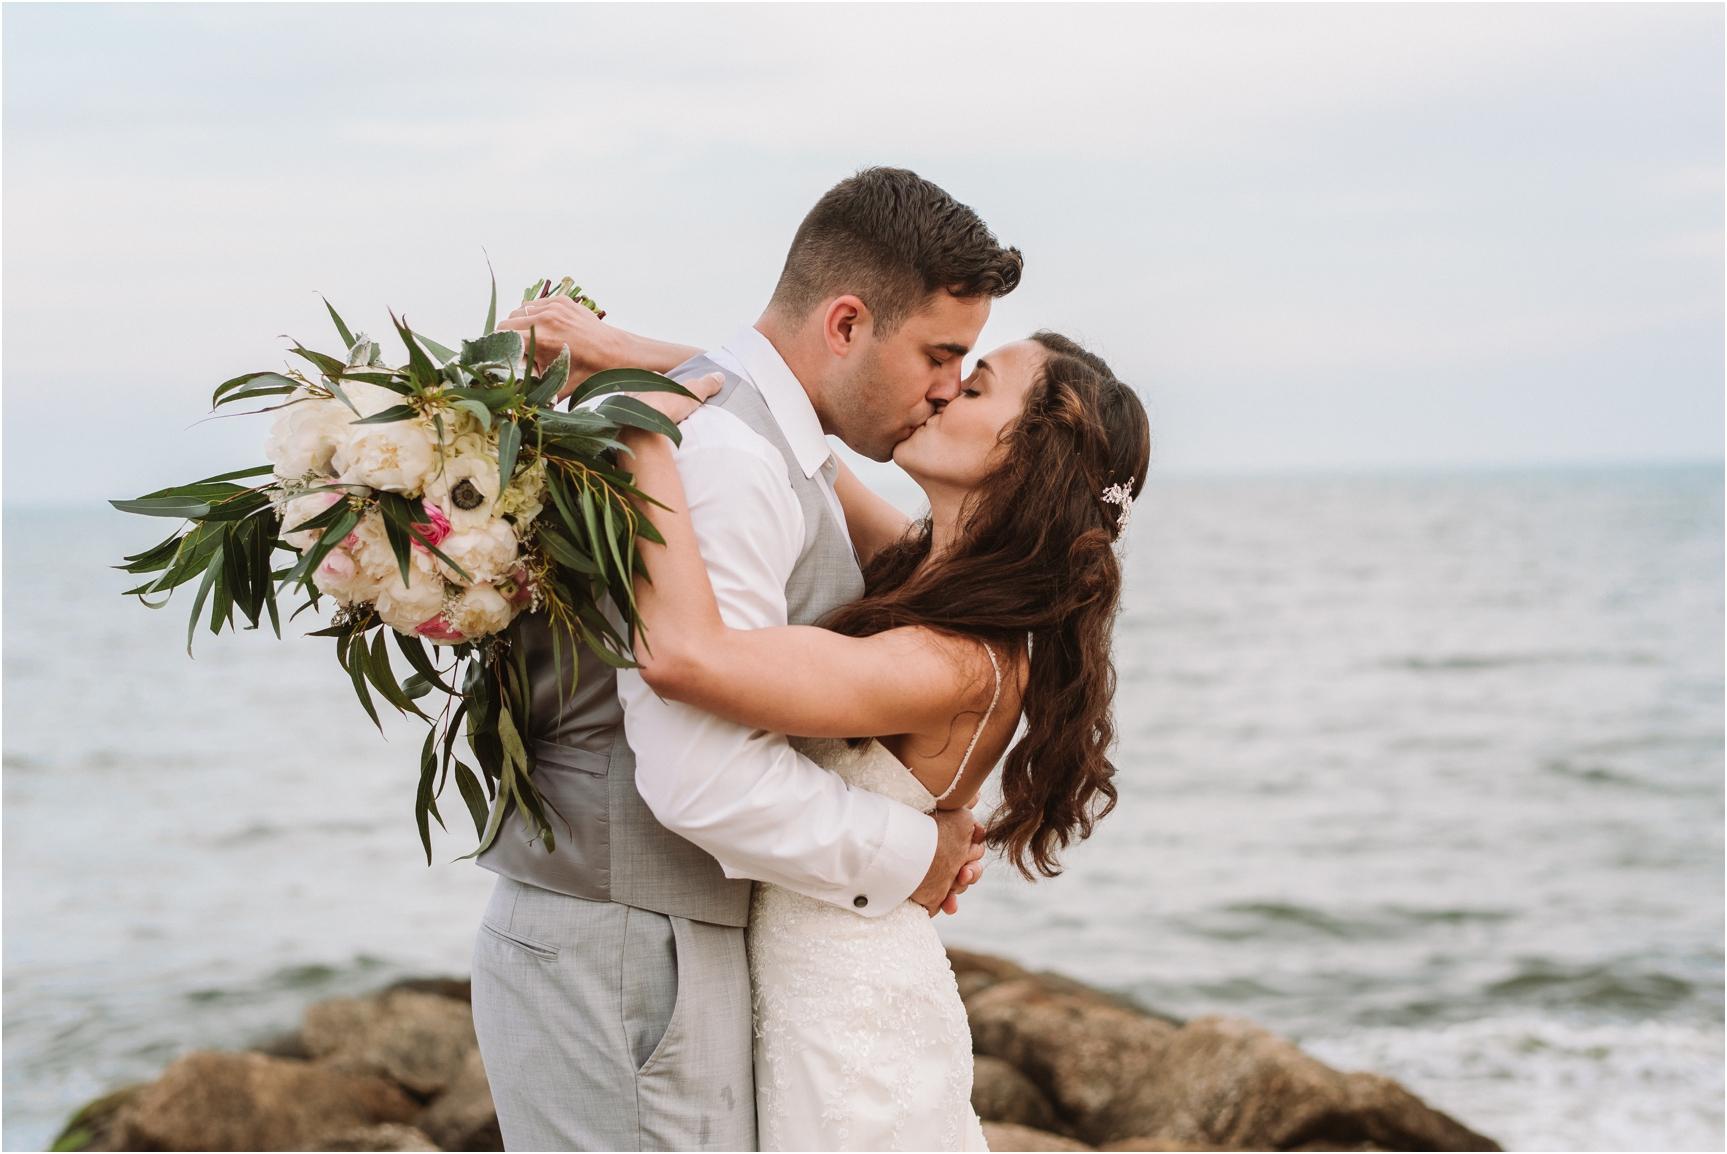 Sarah & Sam Pelham House Cape Cod Wedding Photographer-179.jpg